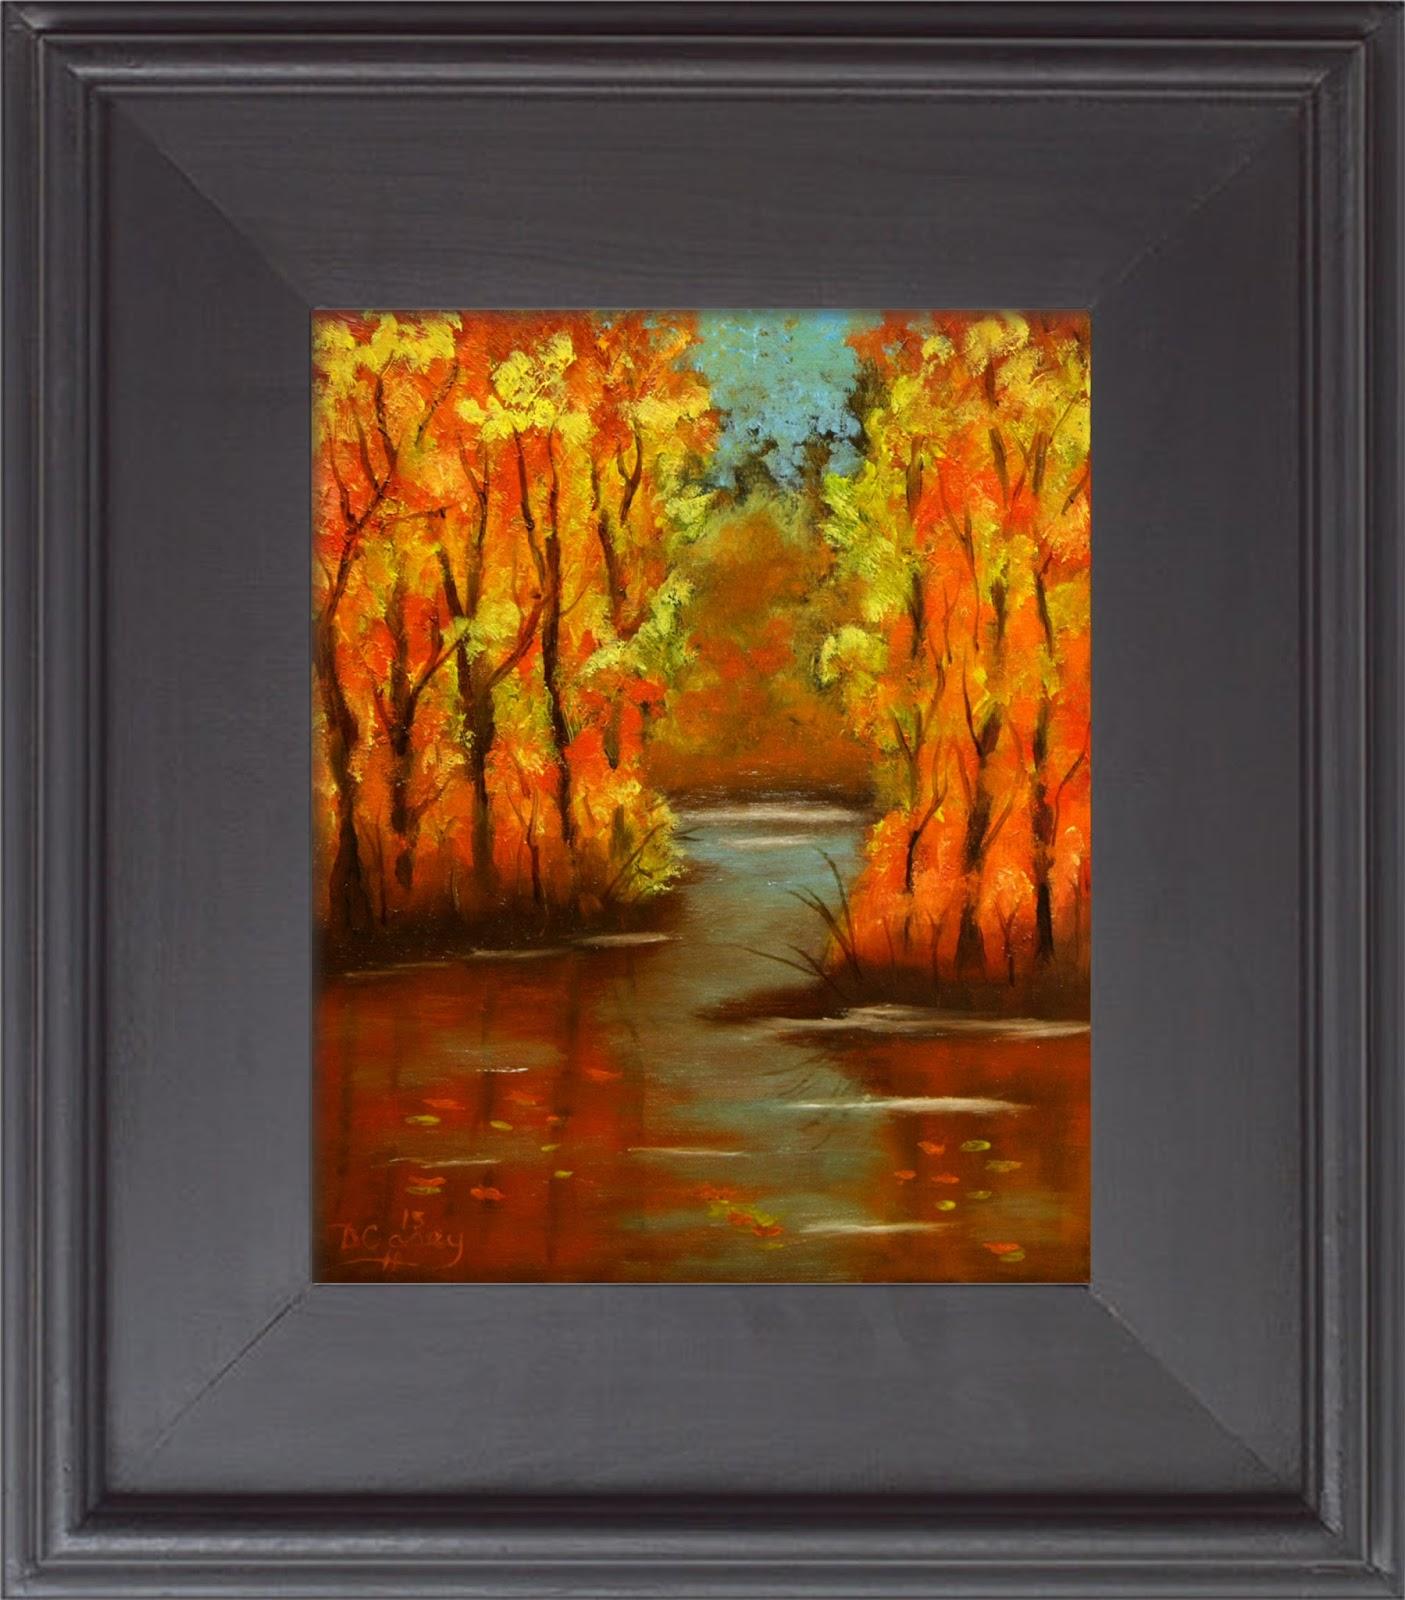 150208 - Autumn Landscape 001a 10x8 oil on linen panel - Dave Casey - TheDailyPainter.jpg